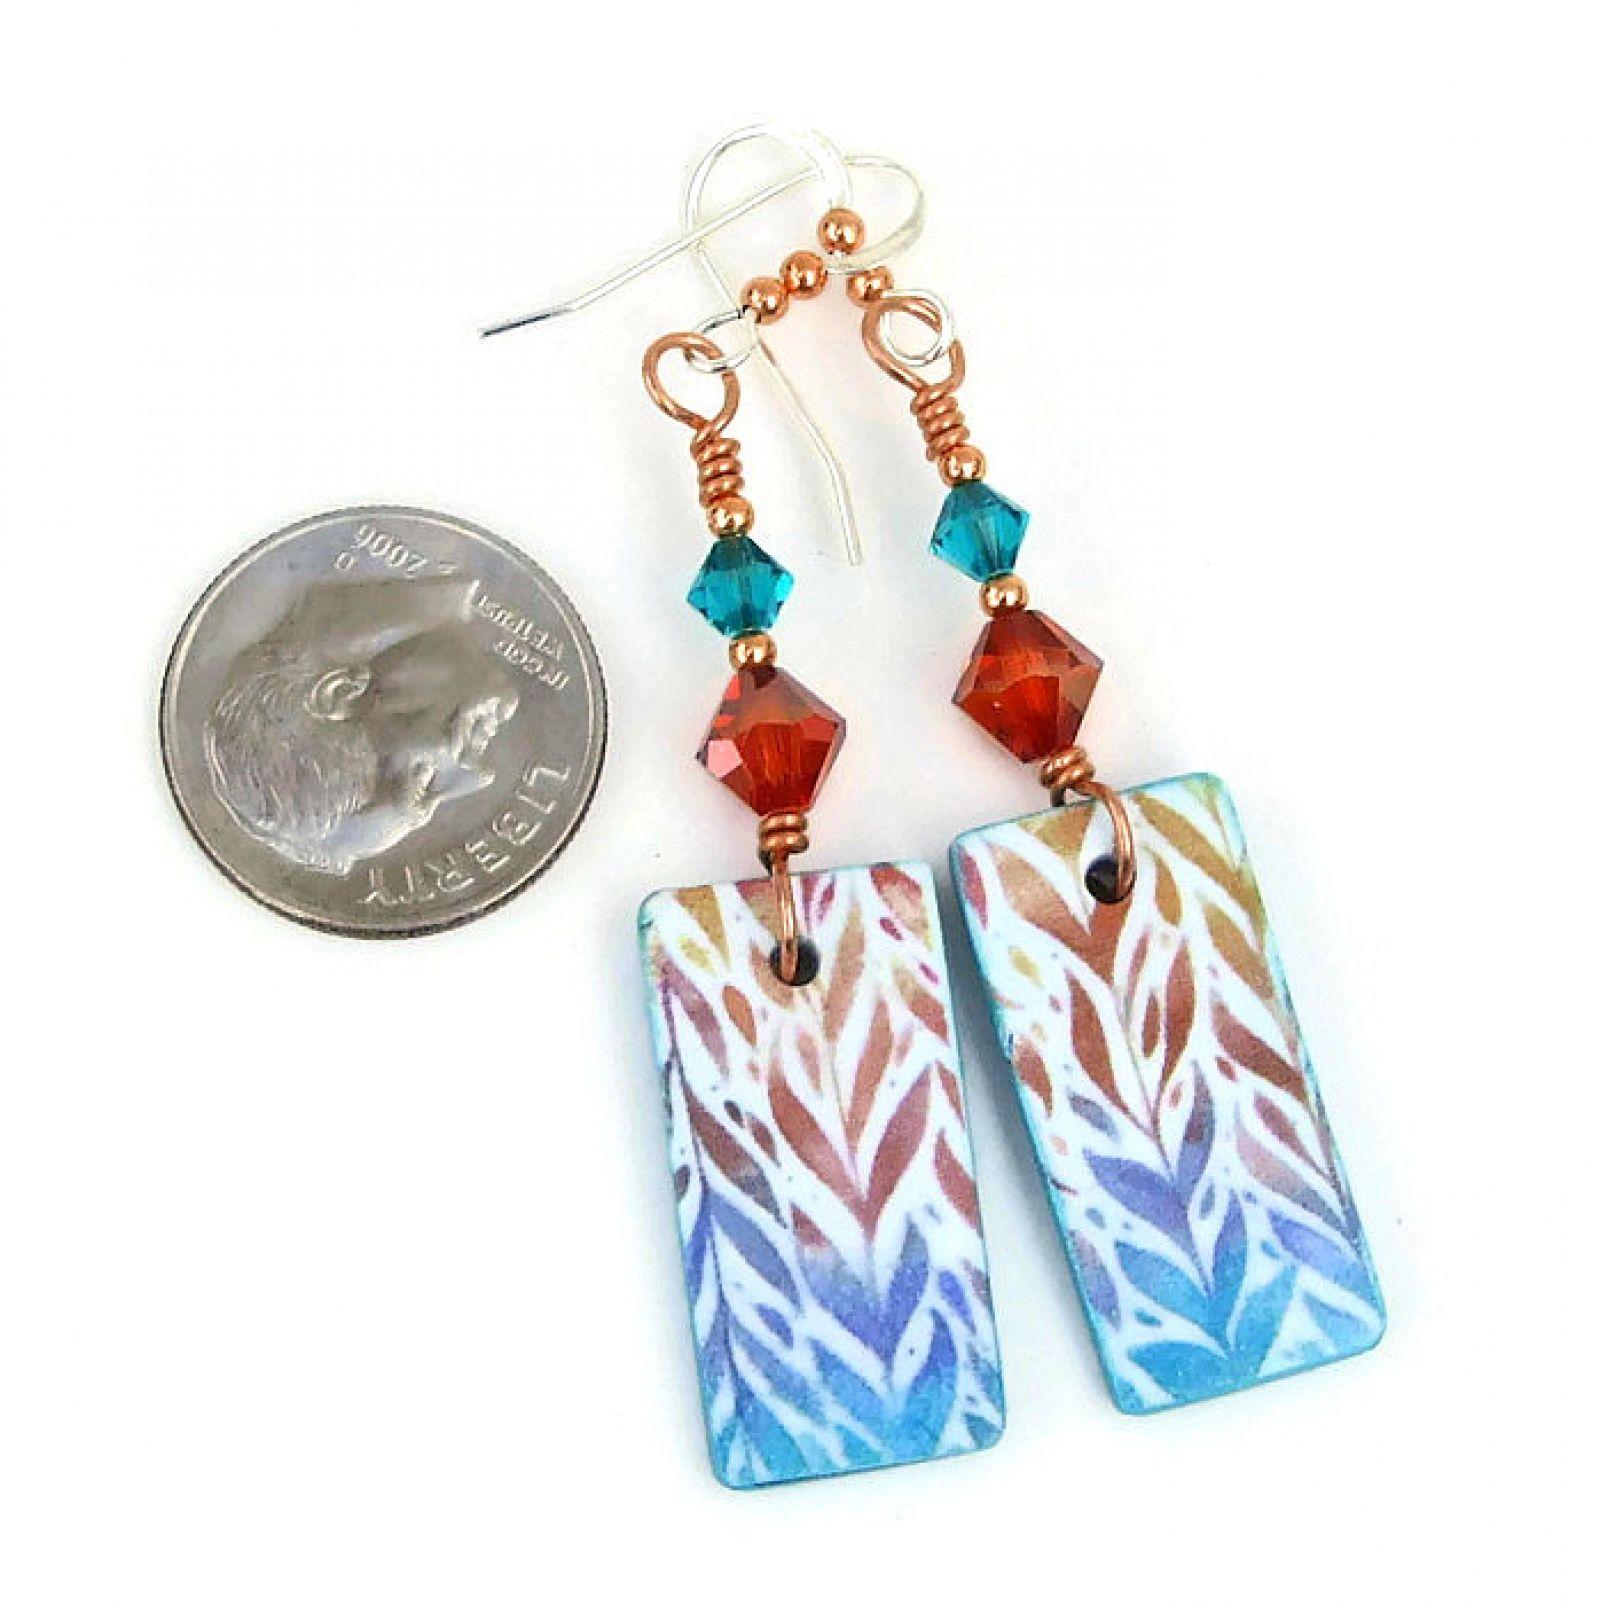 Colorful polymer clay earrings handmade jewelry